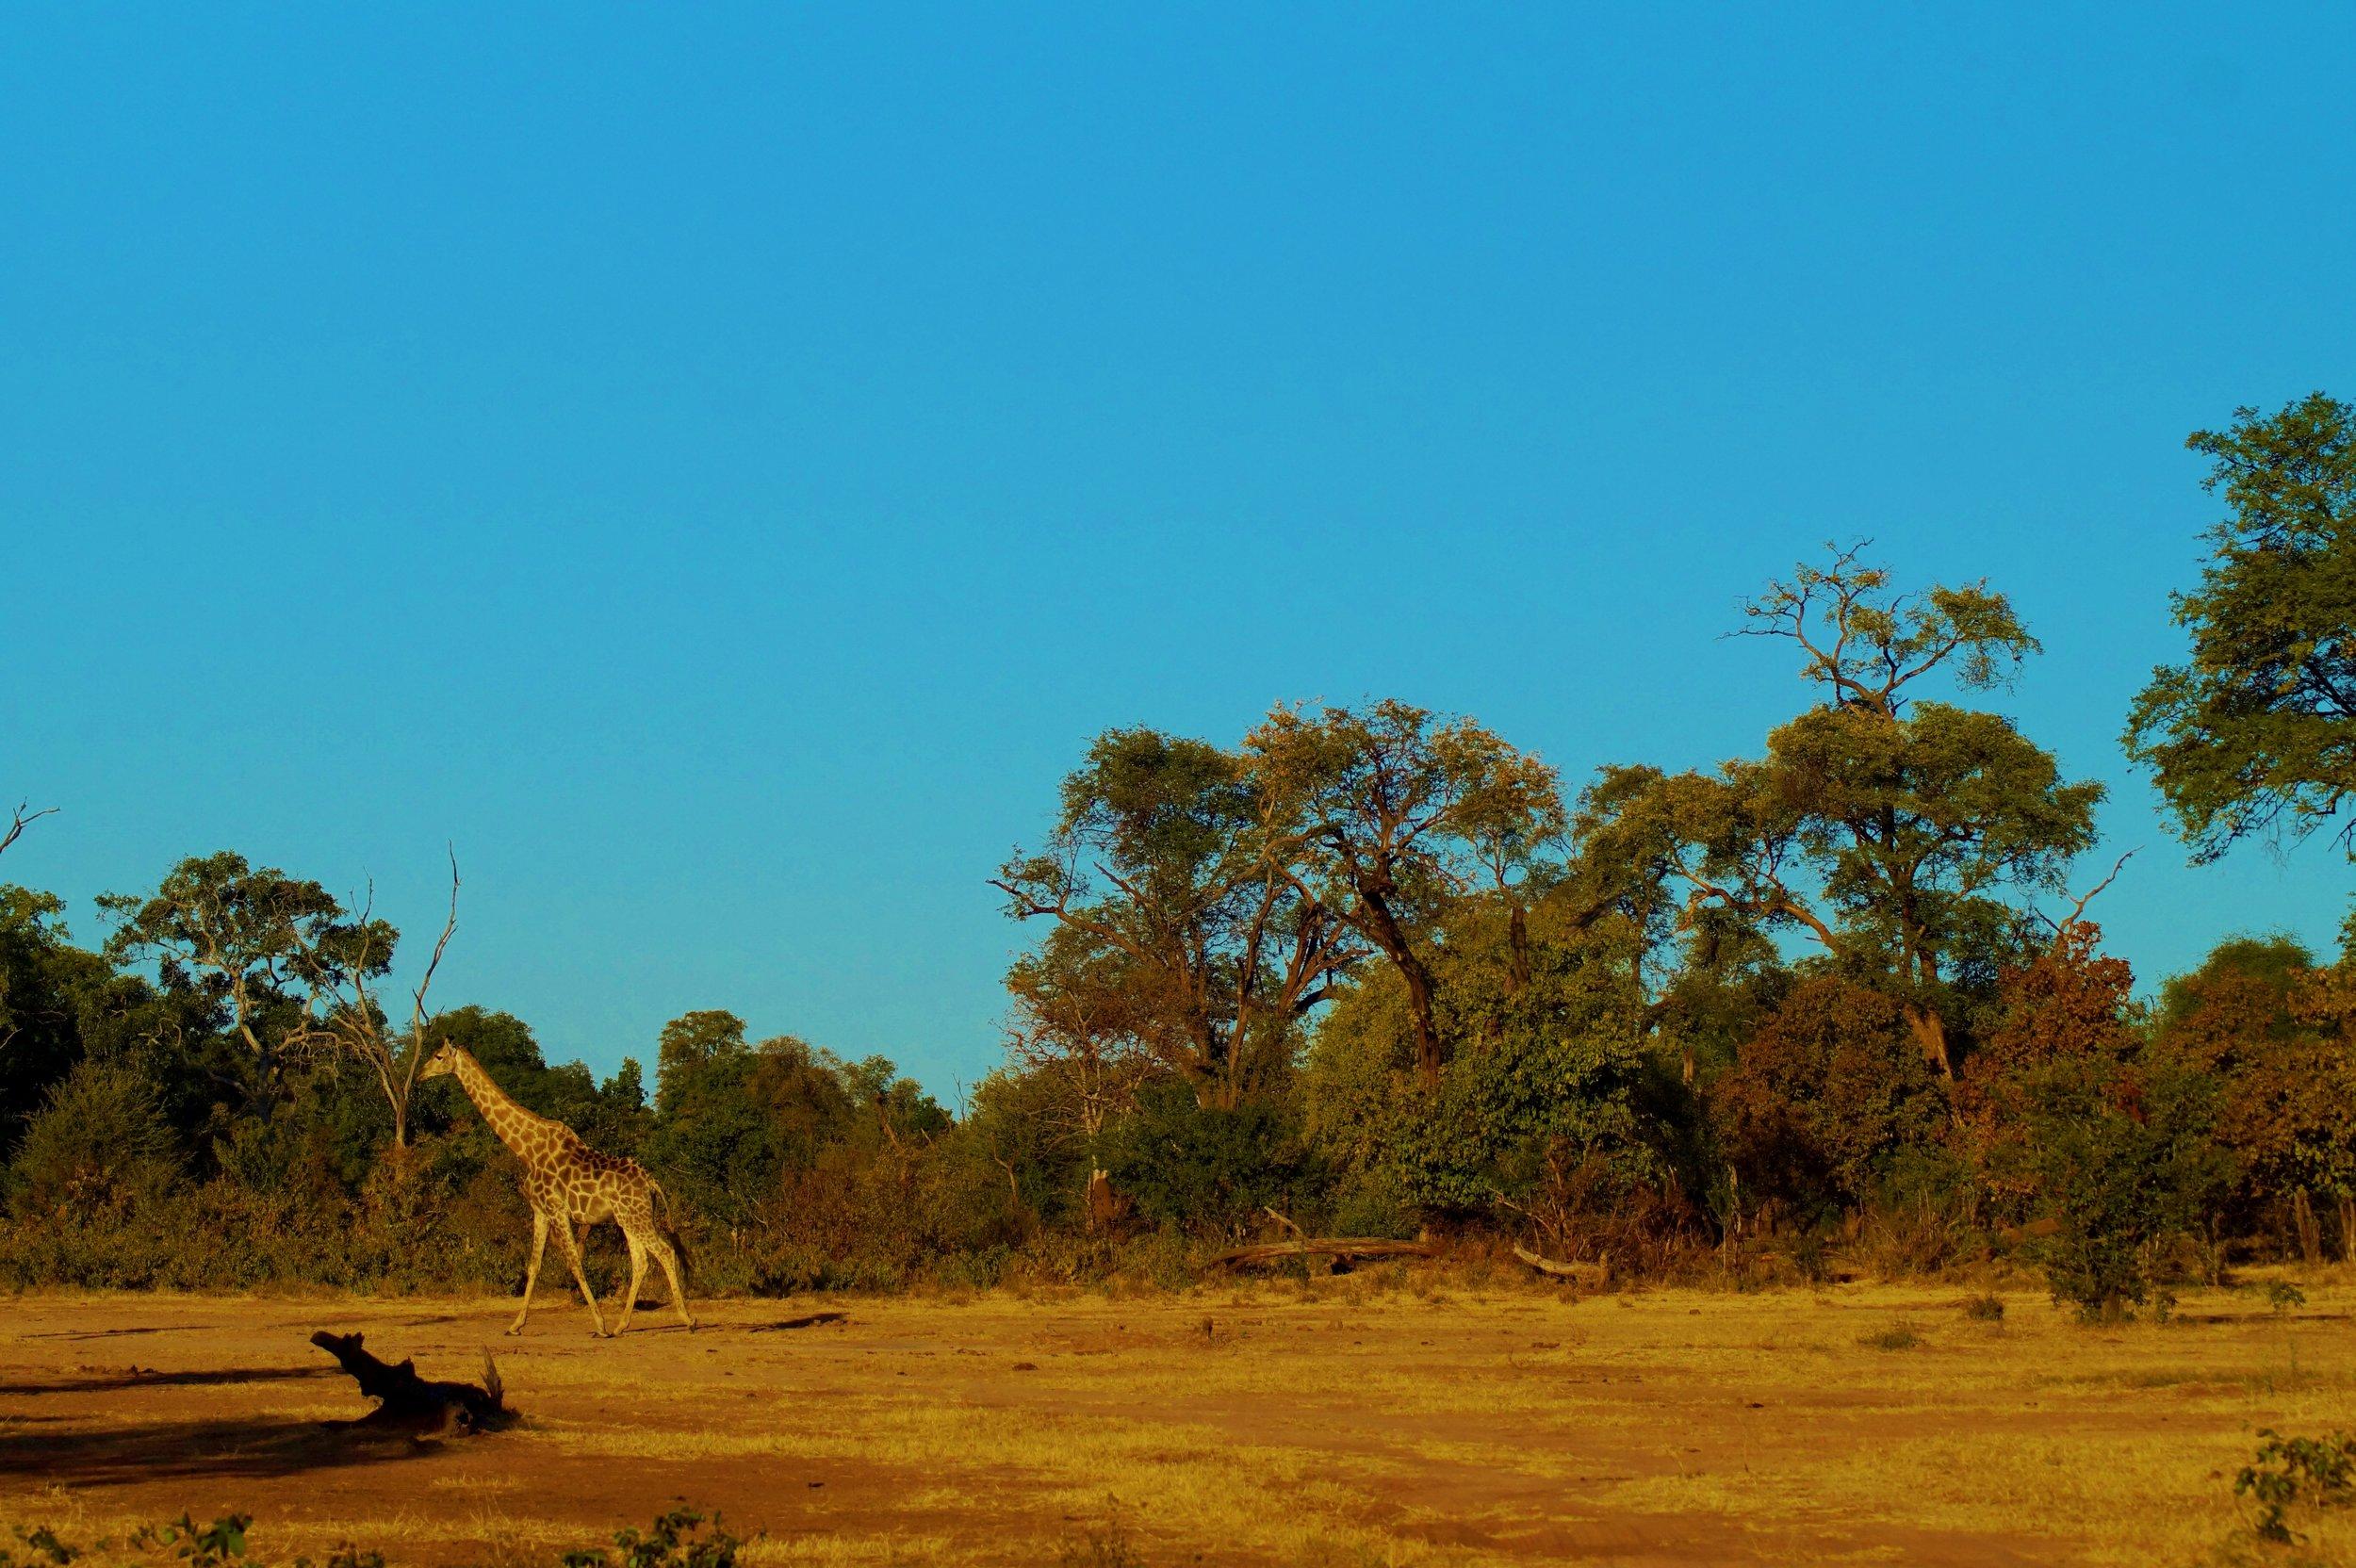 Giraffe in Zambezi National Park